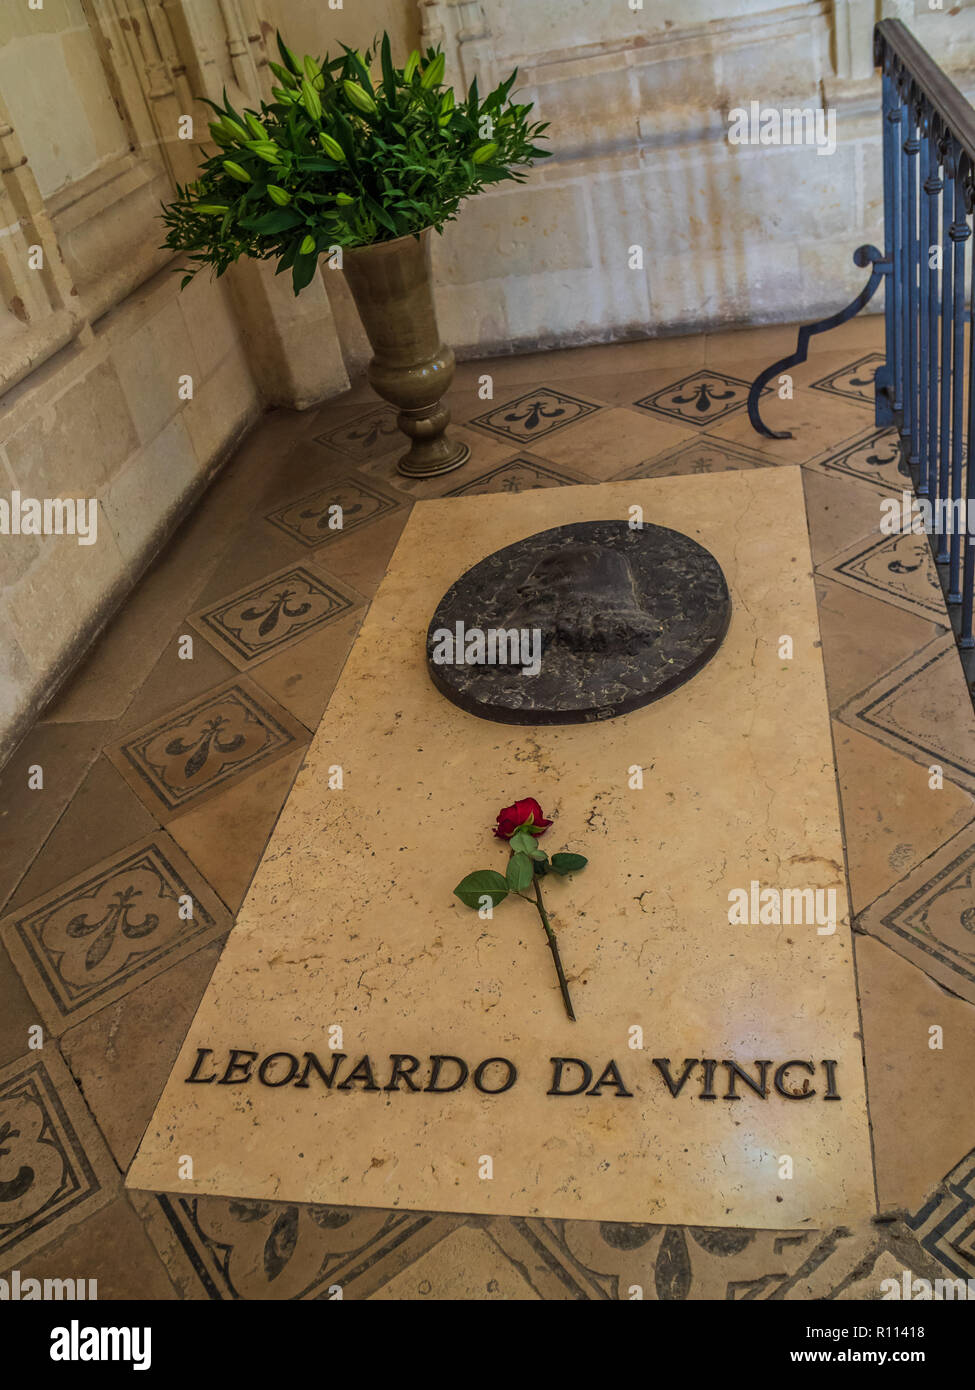 Leonardo Da Vinci Tomb In Chateau D Amboise Stock Photo Alamy